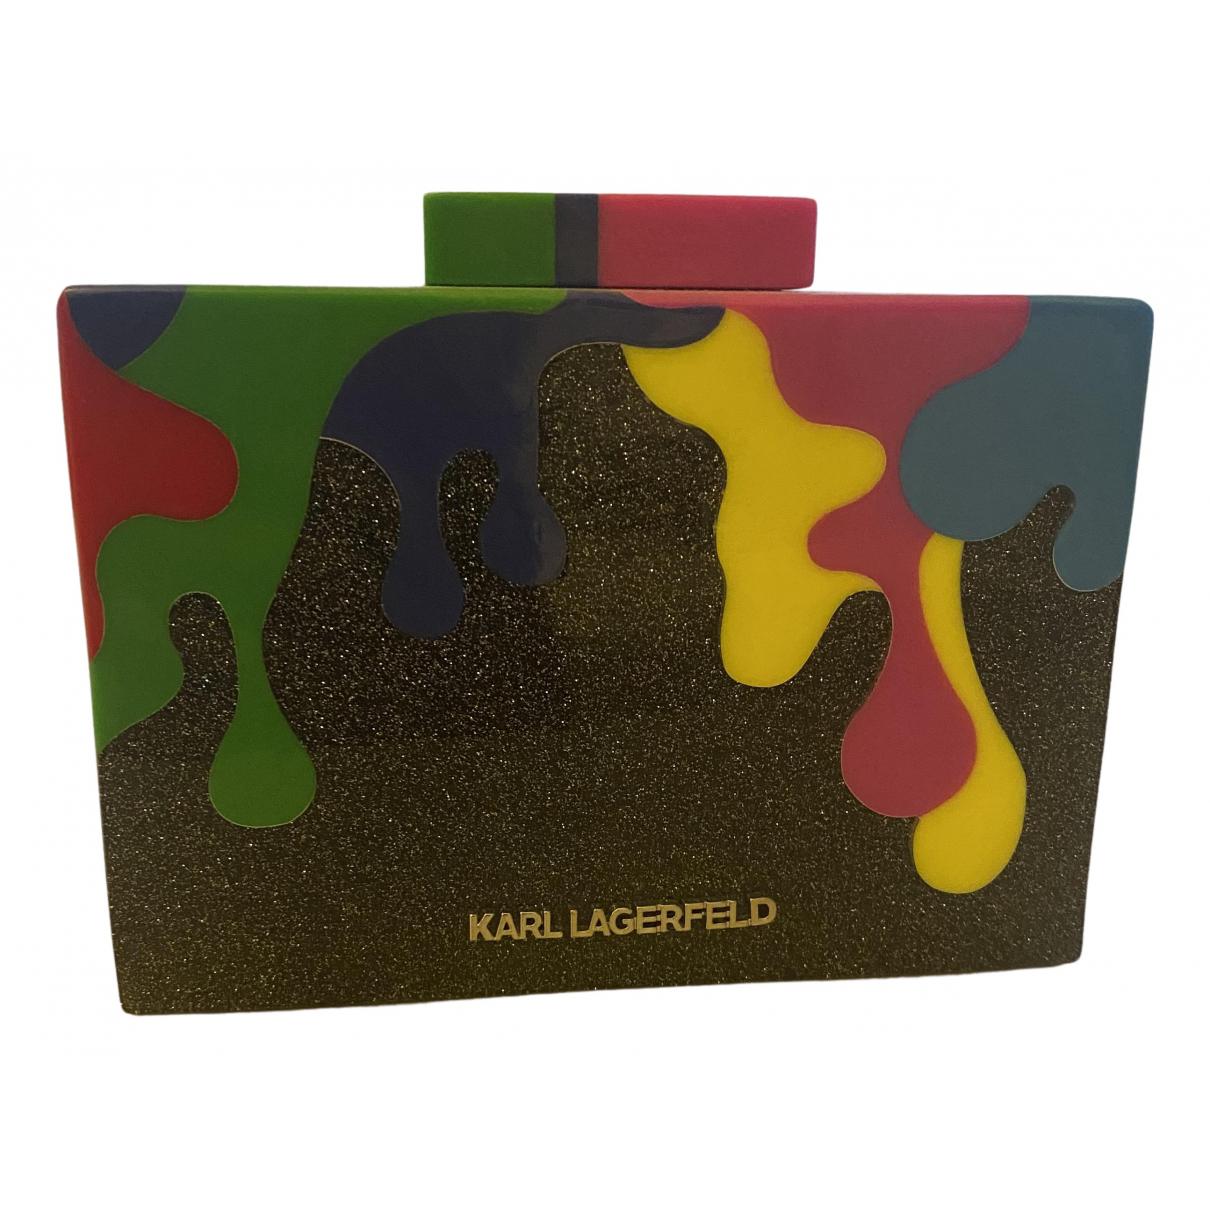 Pochette de Con lentejuelas Karl Lagerfeld